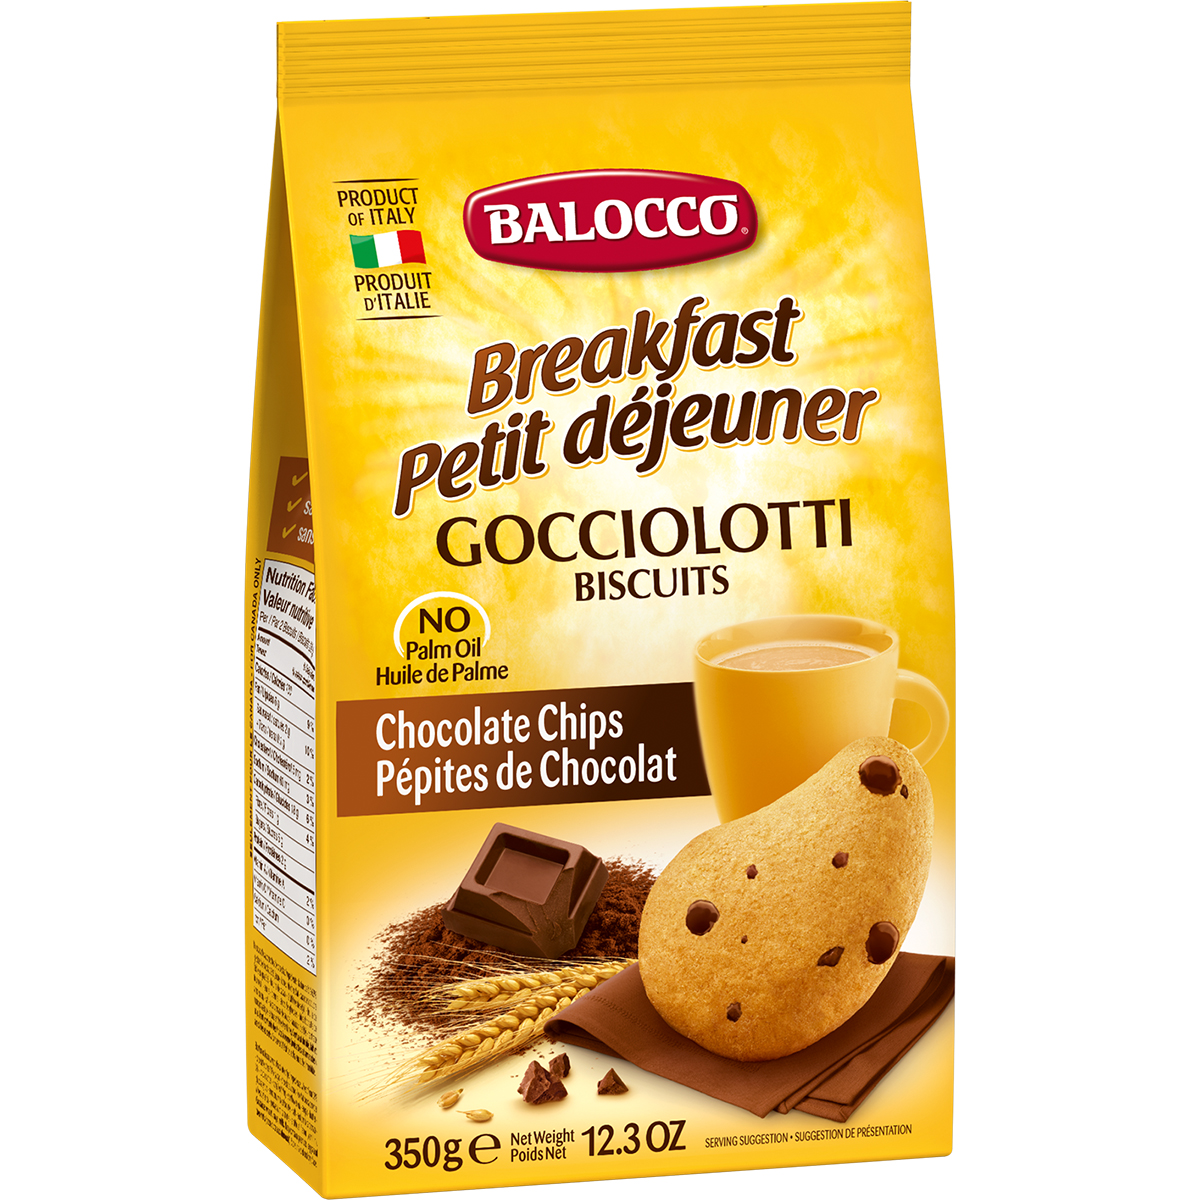 Biscuiti cu bucati de ciocolata Balocco Gocciolotti, 350 g imagine